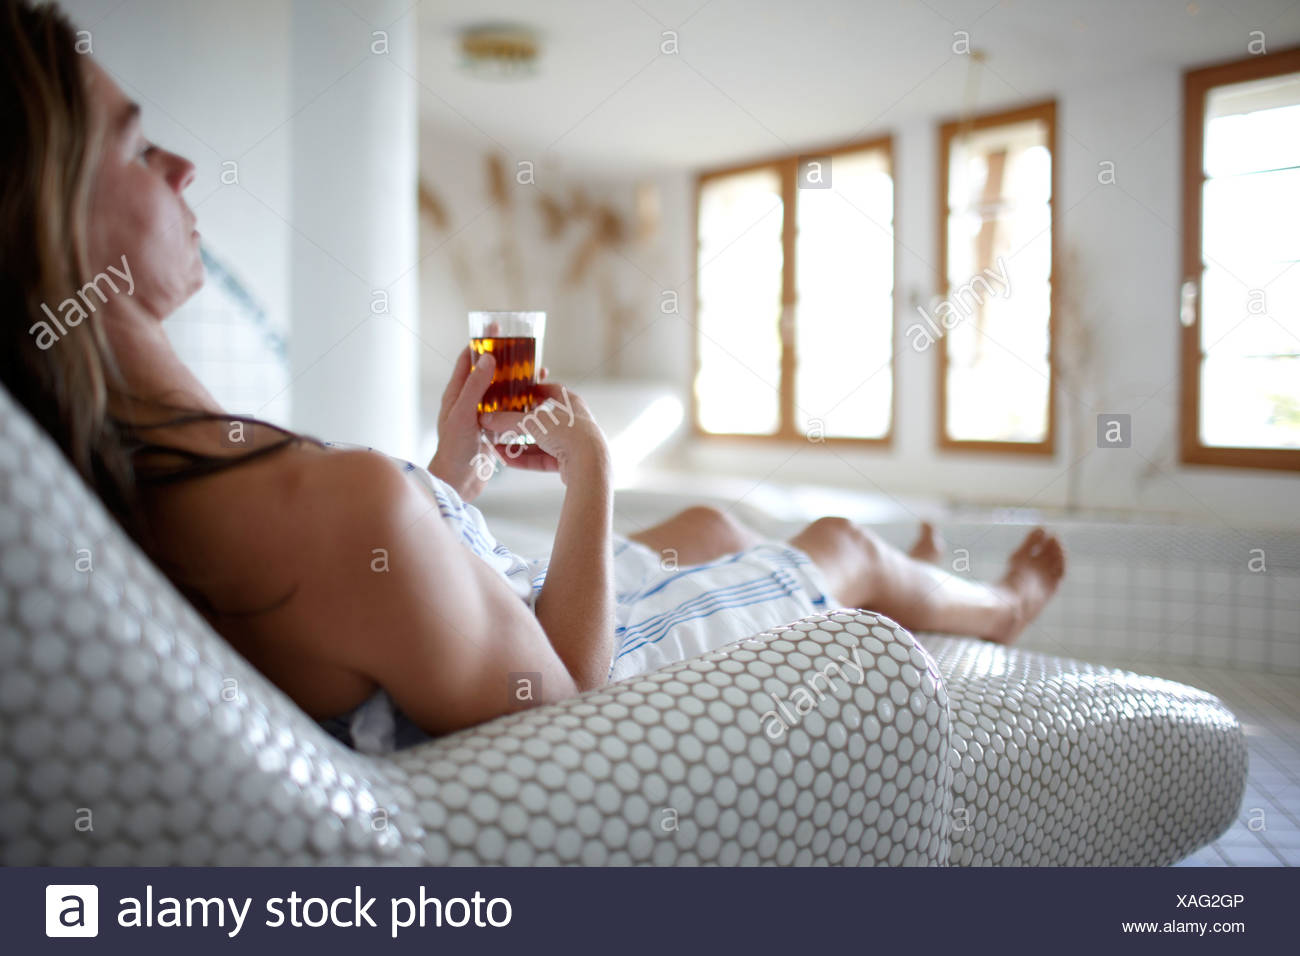 Woman enjoying a cup of tea in a spa hotel, Am Hochpillberg, Schwaz, Tyrol, Austria - Stock Image